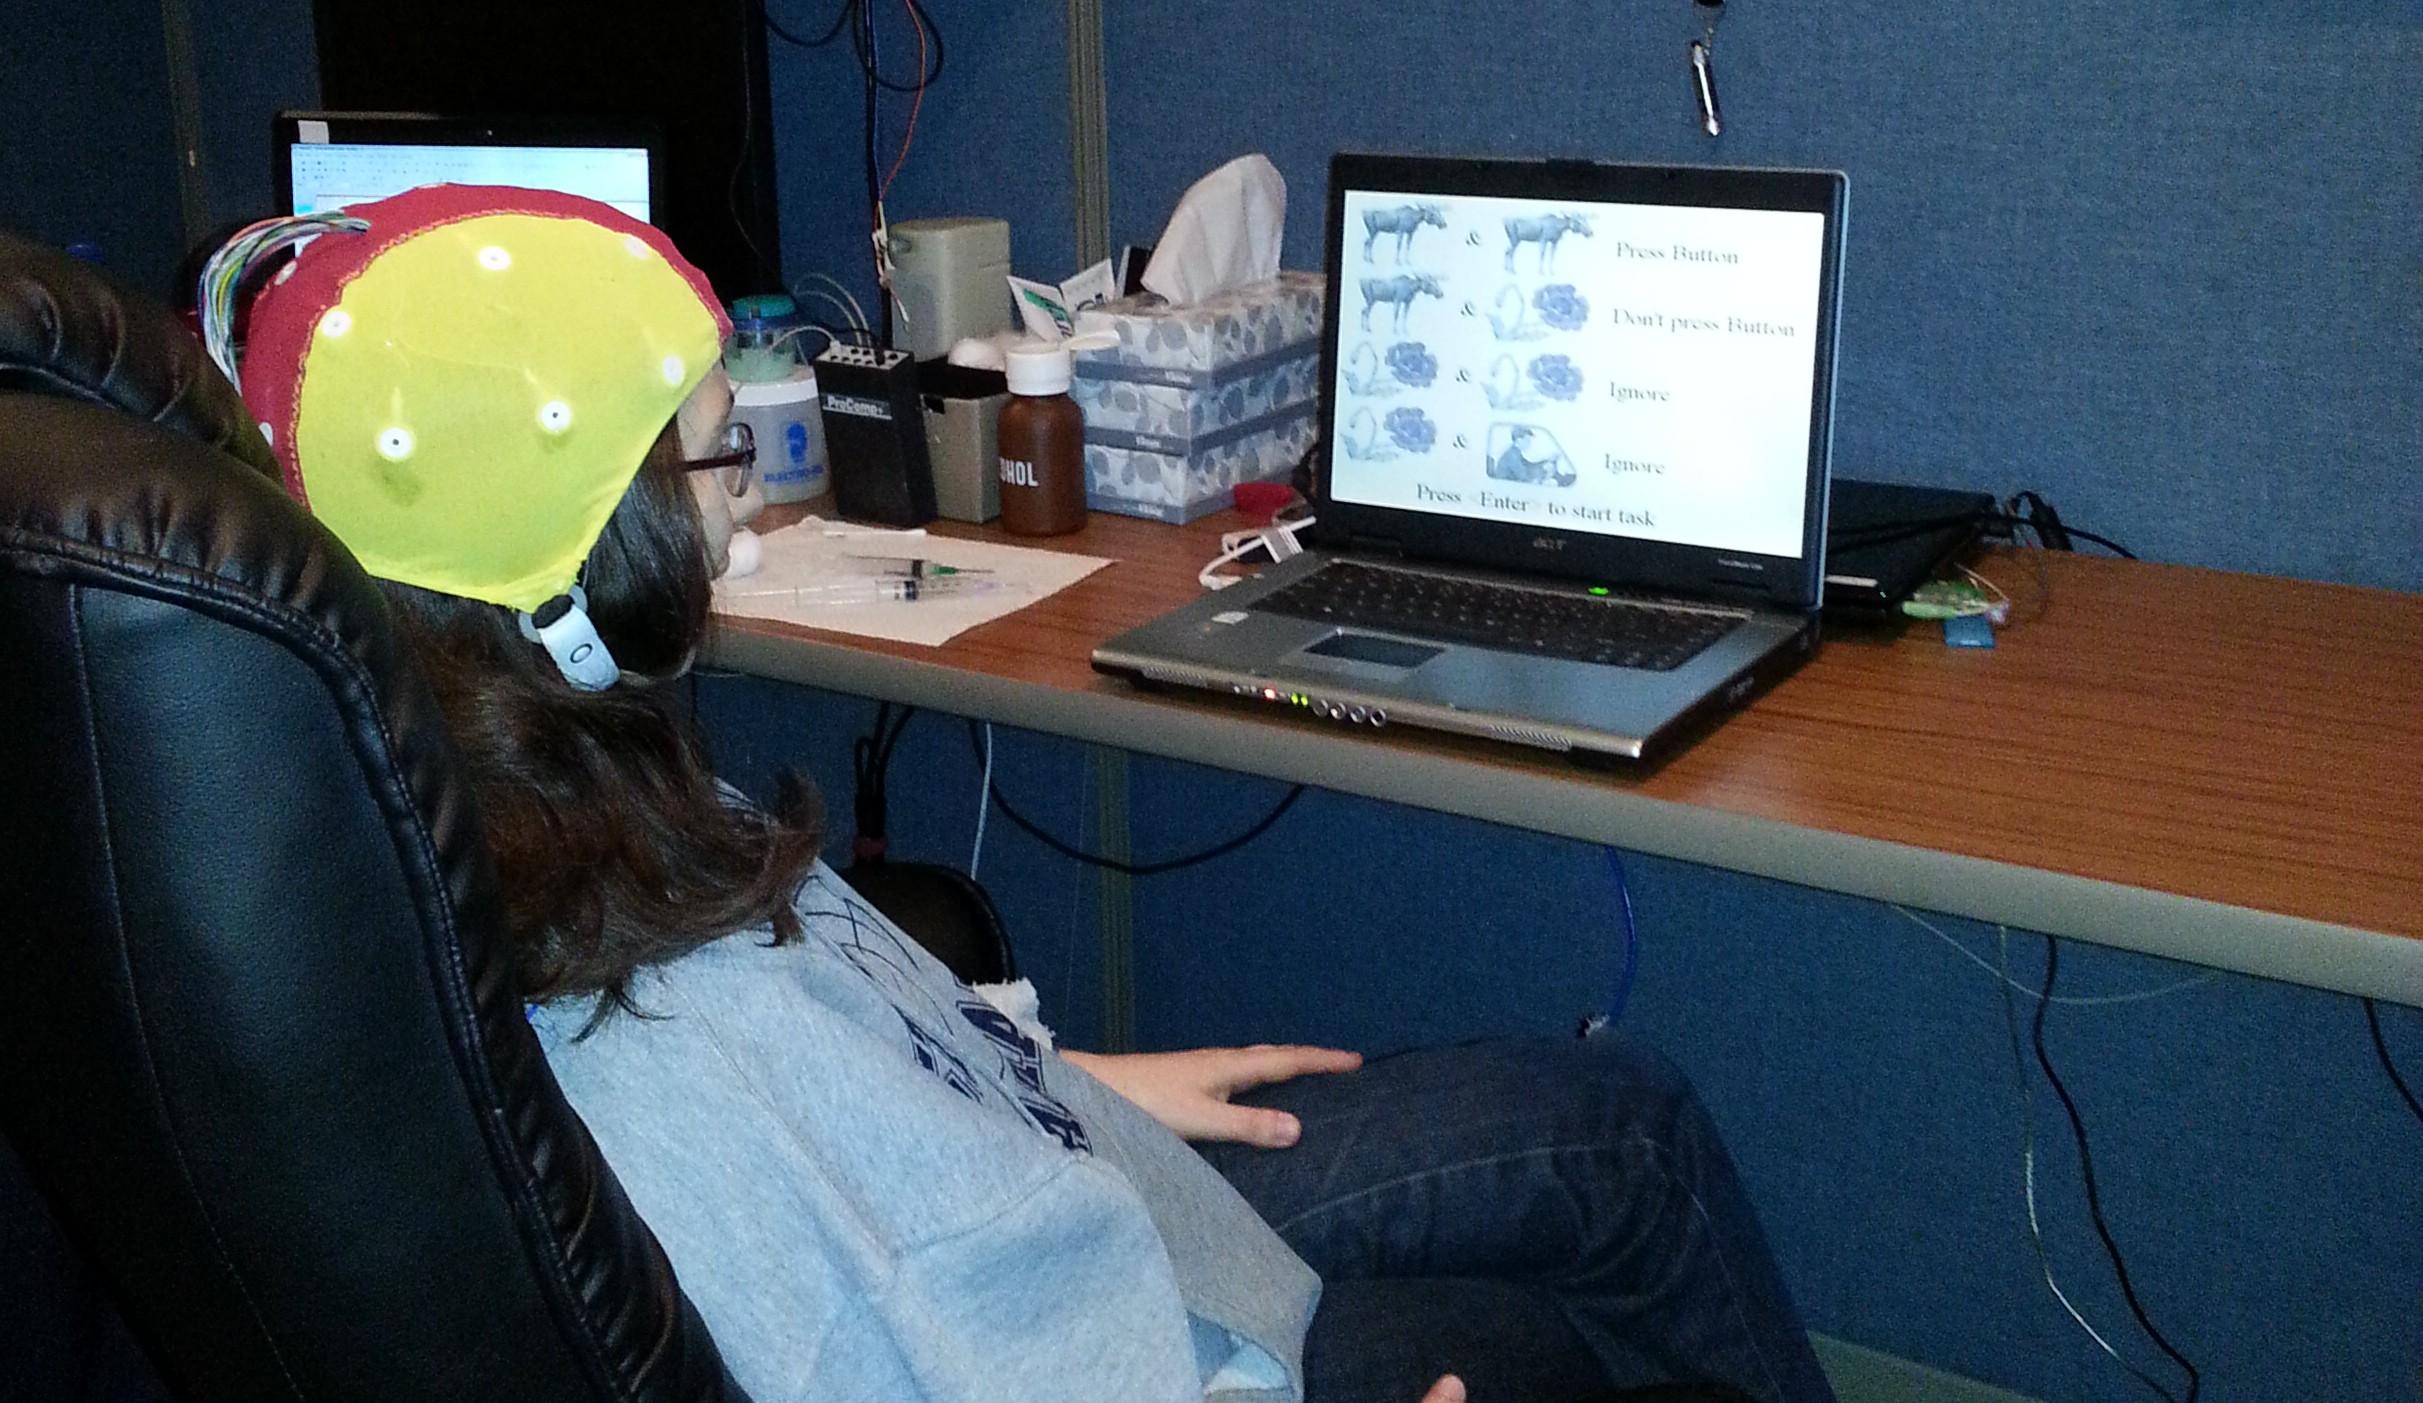 Neuromodulation patient at Sadar Psychological and Sports Center